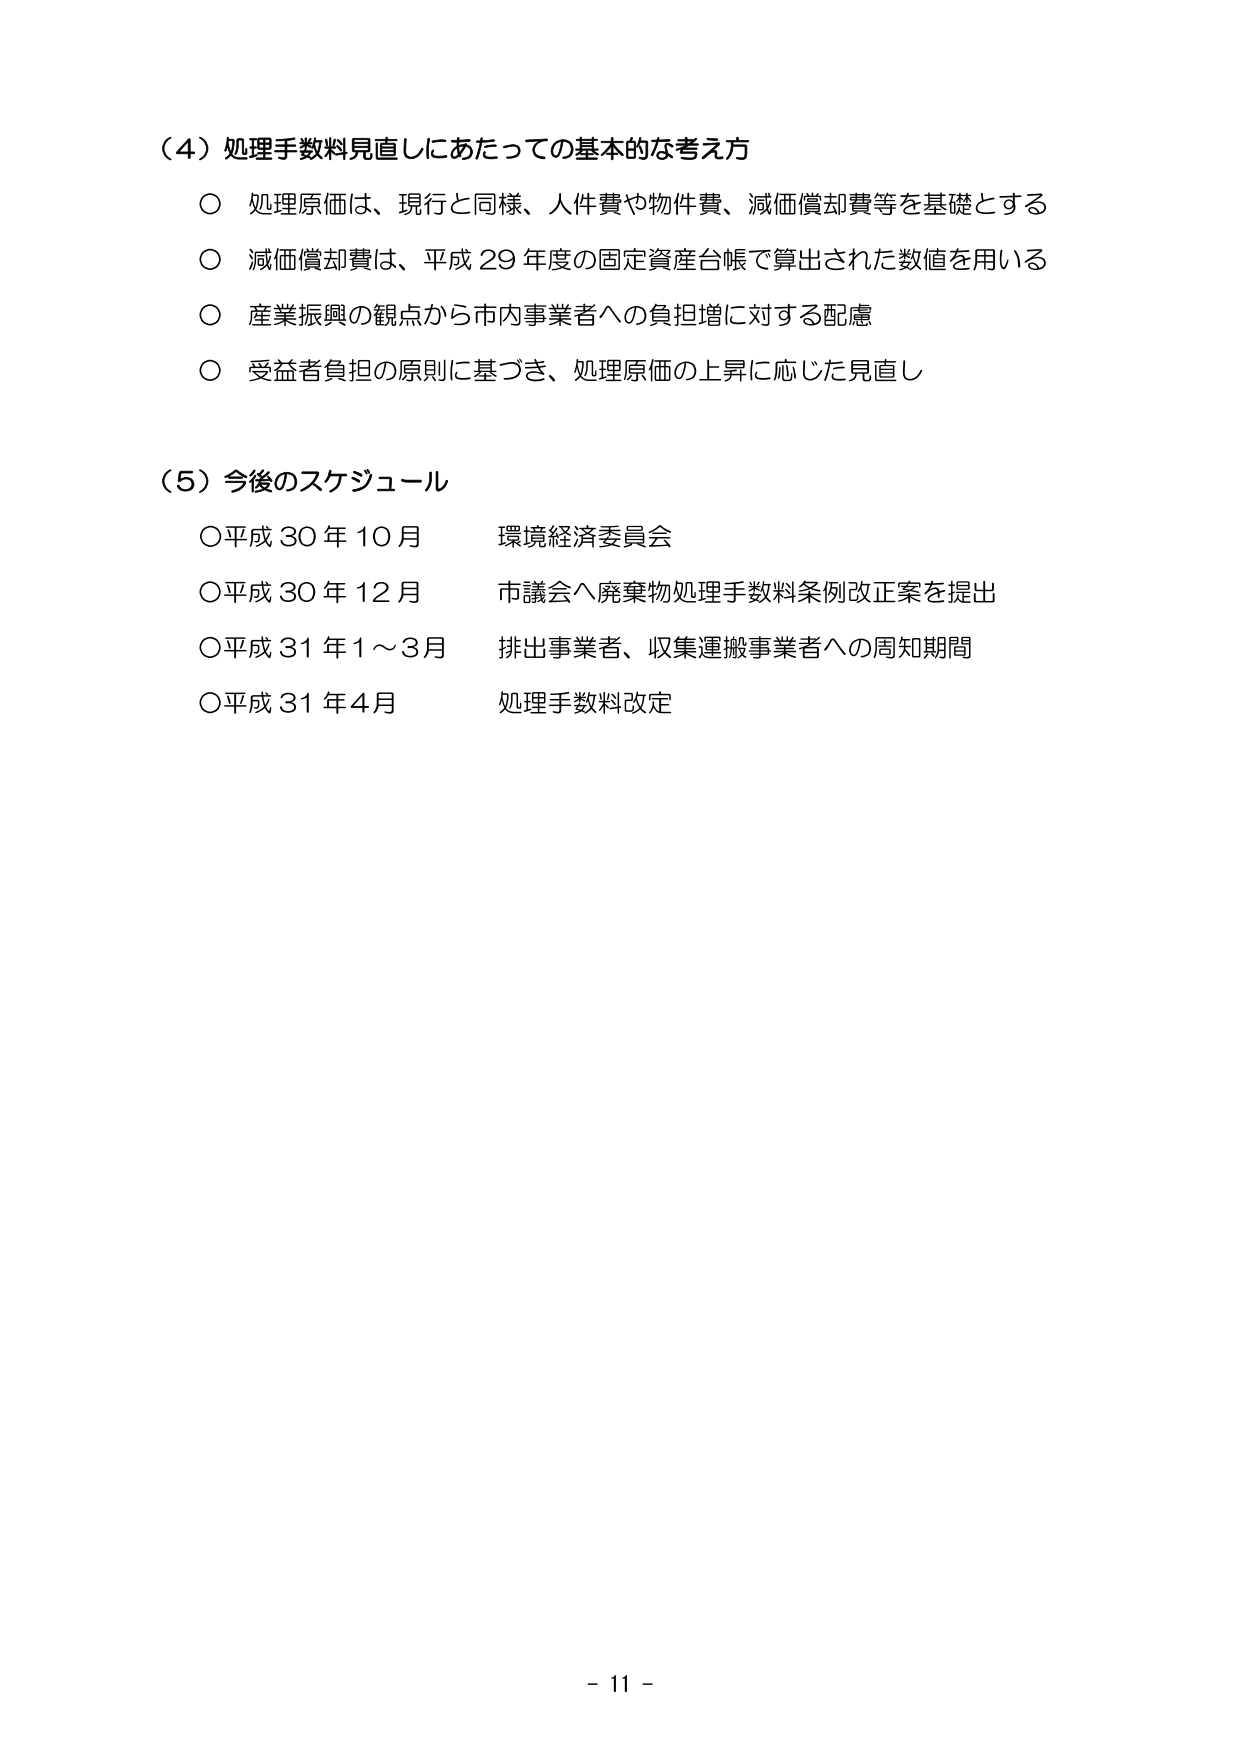 181113_181005kankyokeizai_14